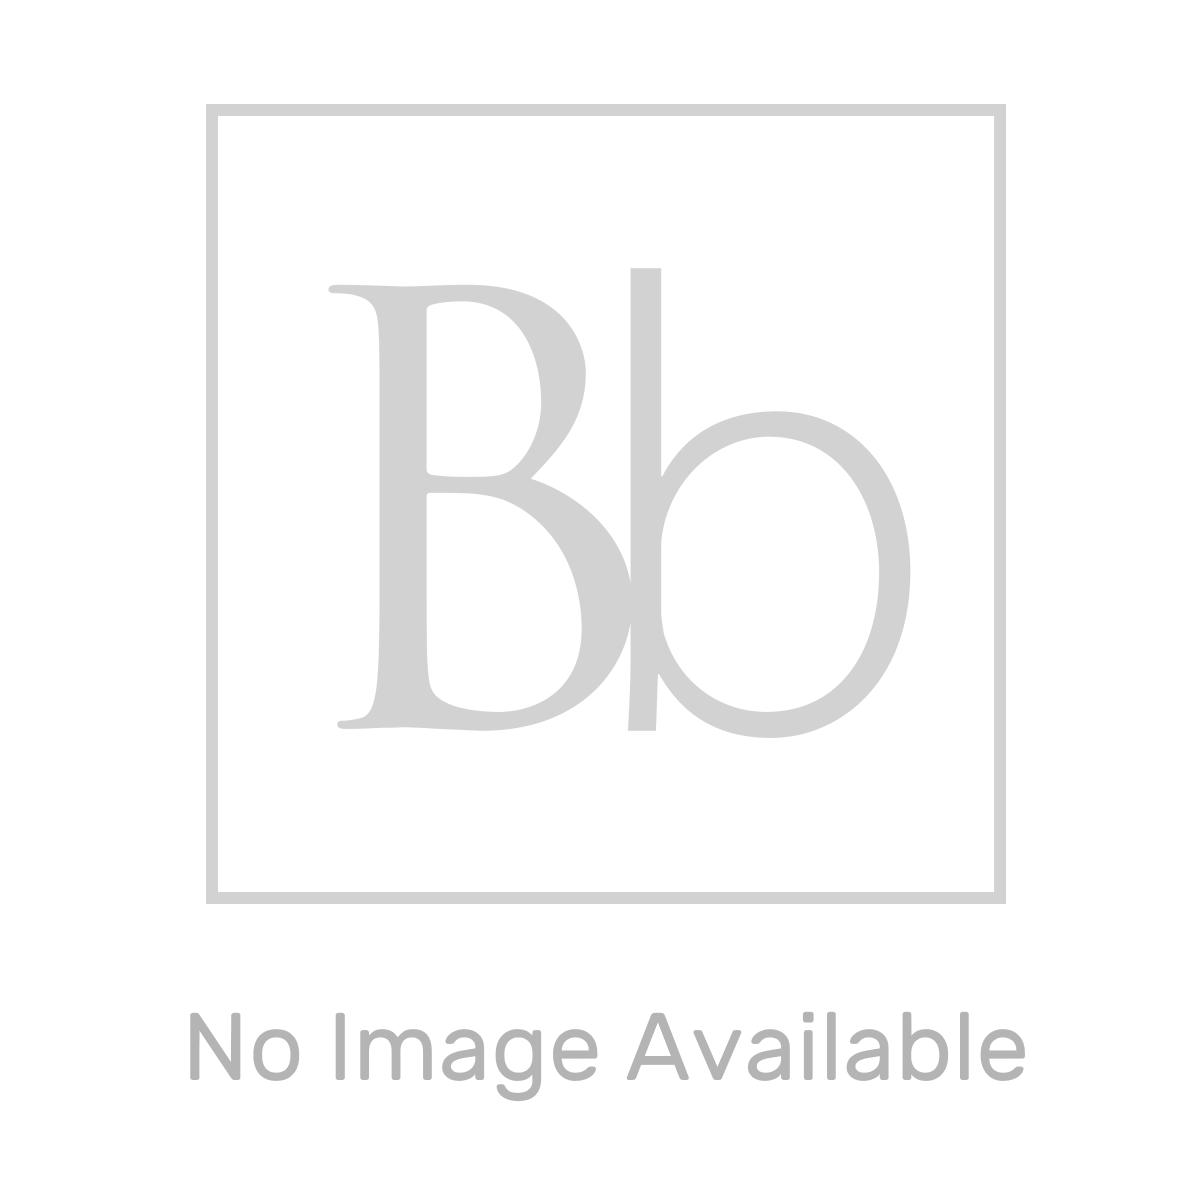 Mito Pearl Grey Wall Hung Tall Unit 350mm Line Drawing